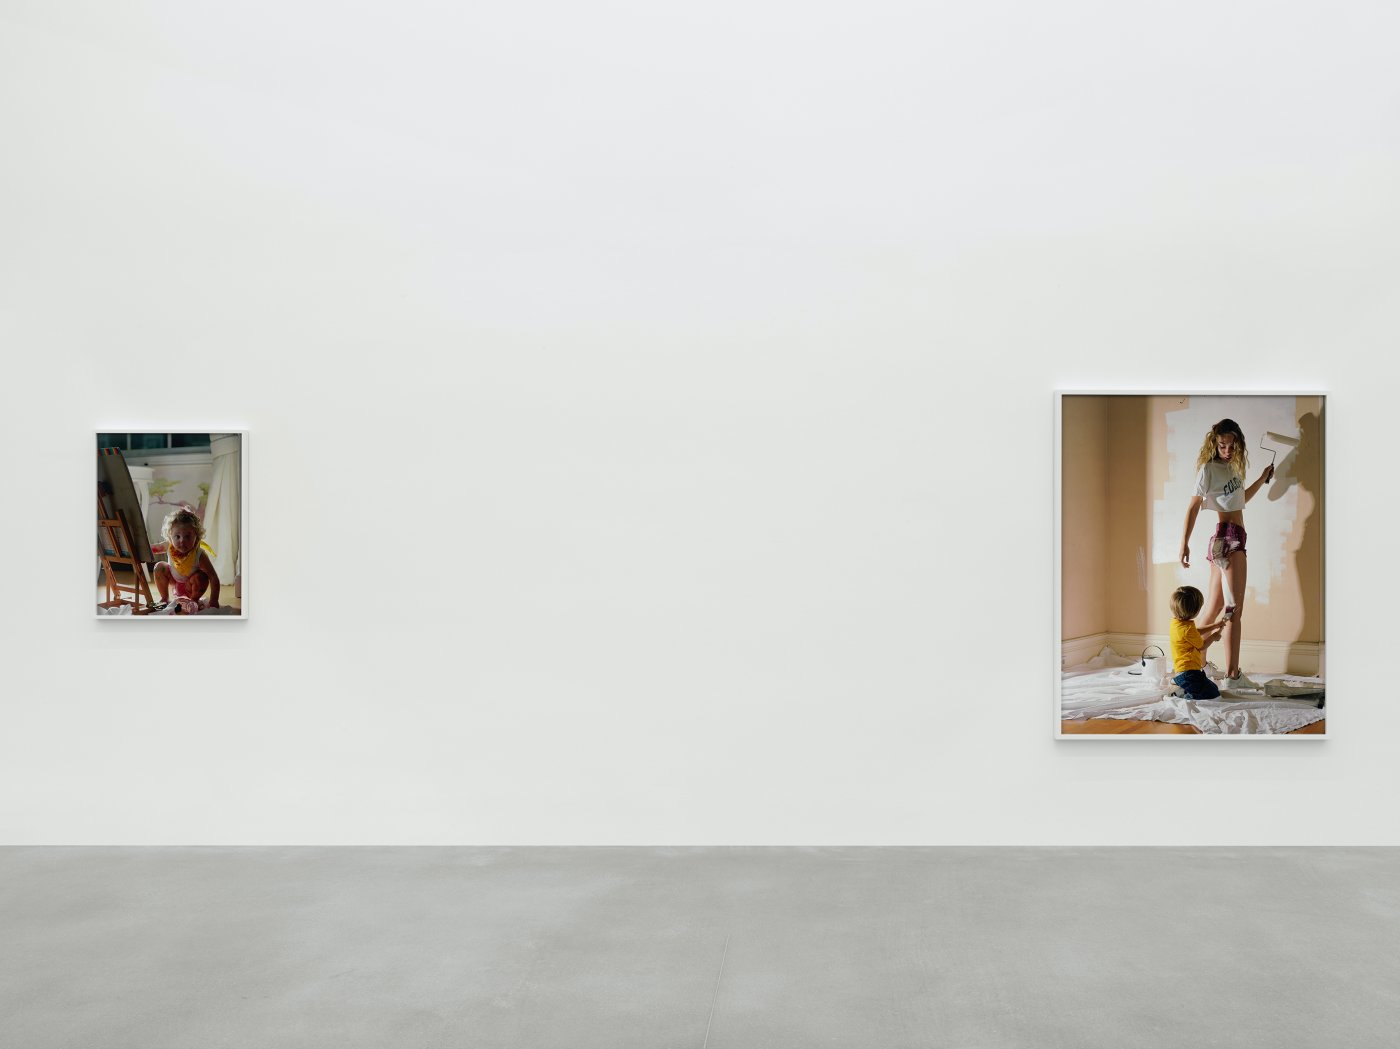 Galerie Eva Presenhuber Waldmanstrasse Torbjorn Rodland 4